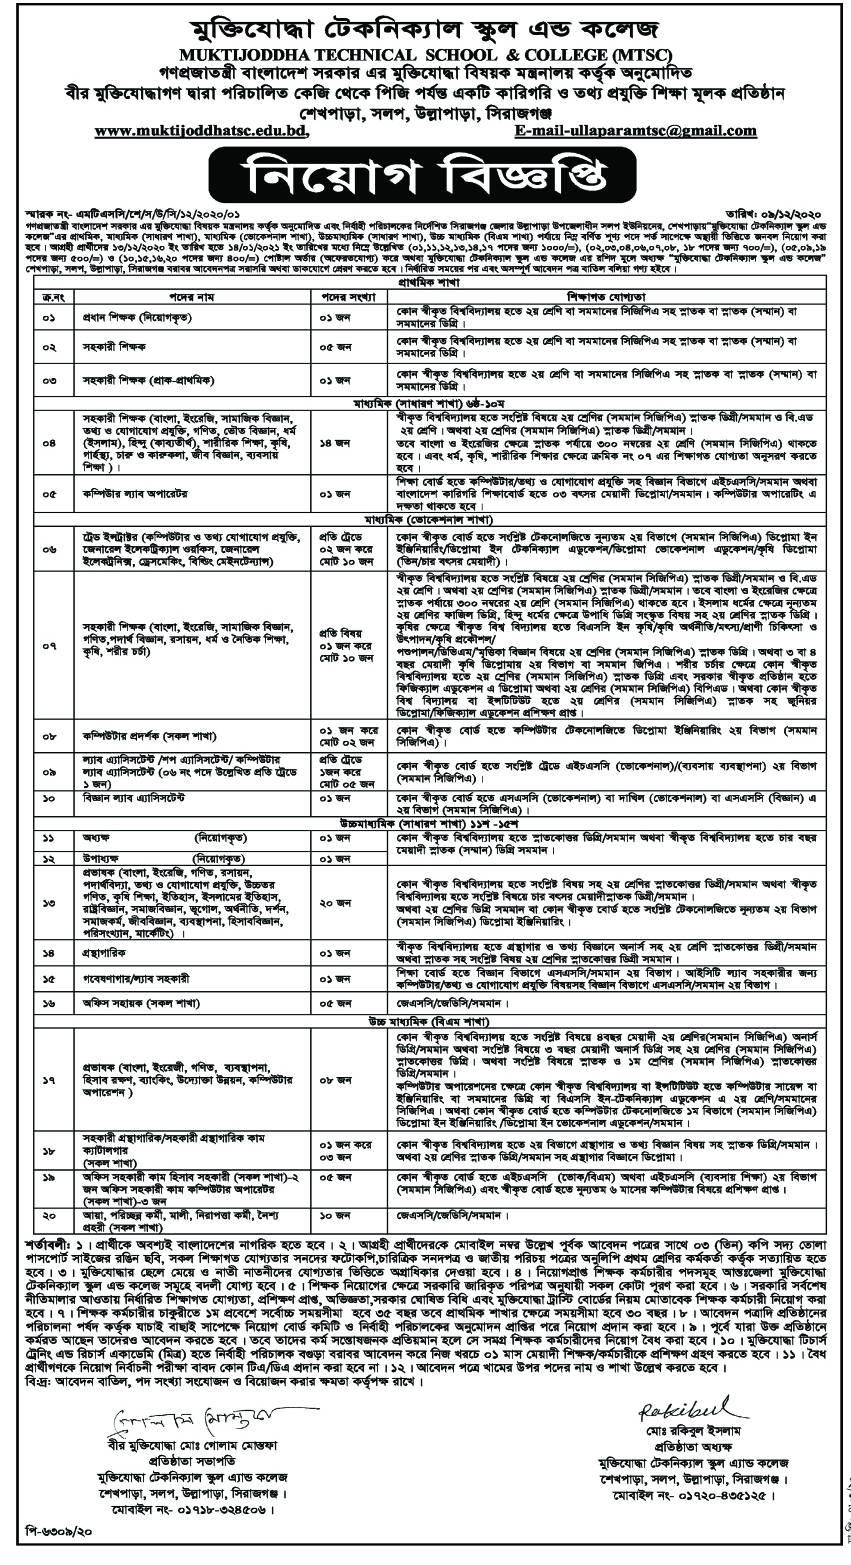 MuktiJuddha Technical School & College (MTSC) Job Circular